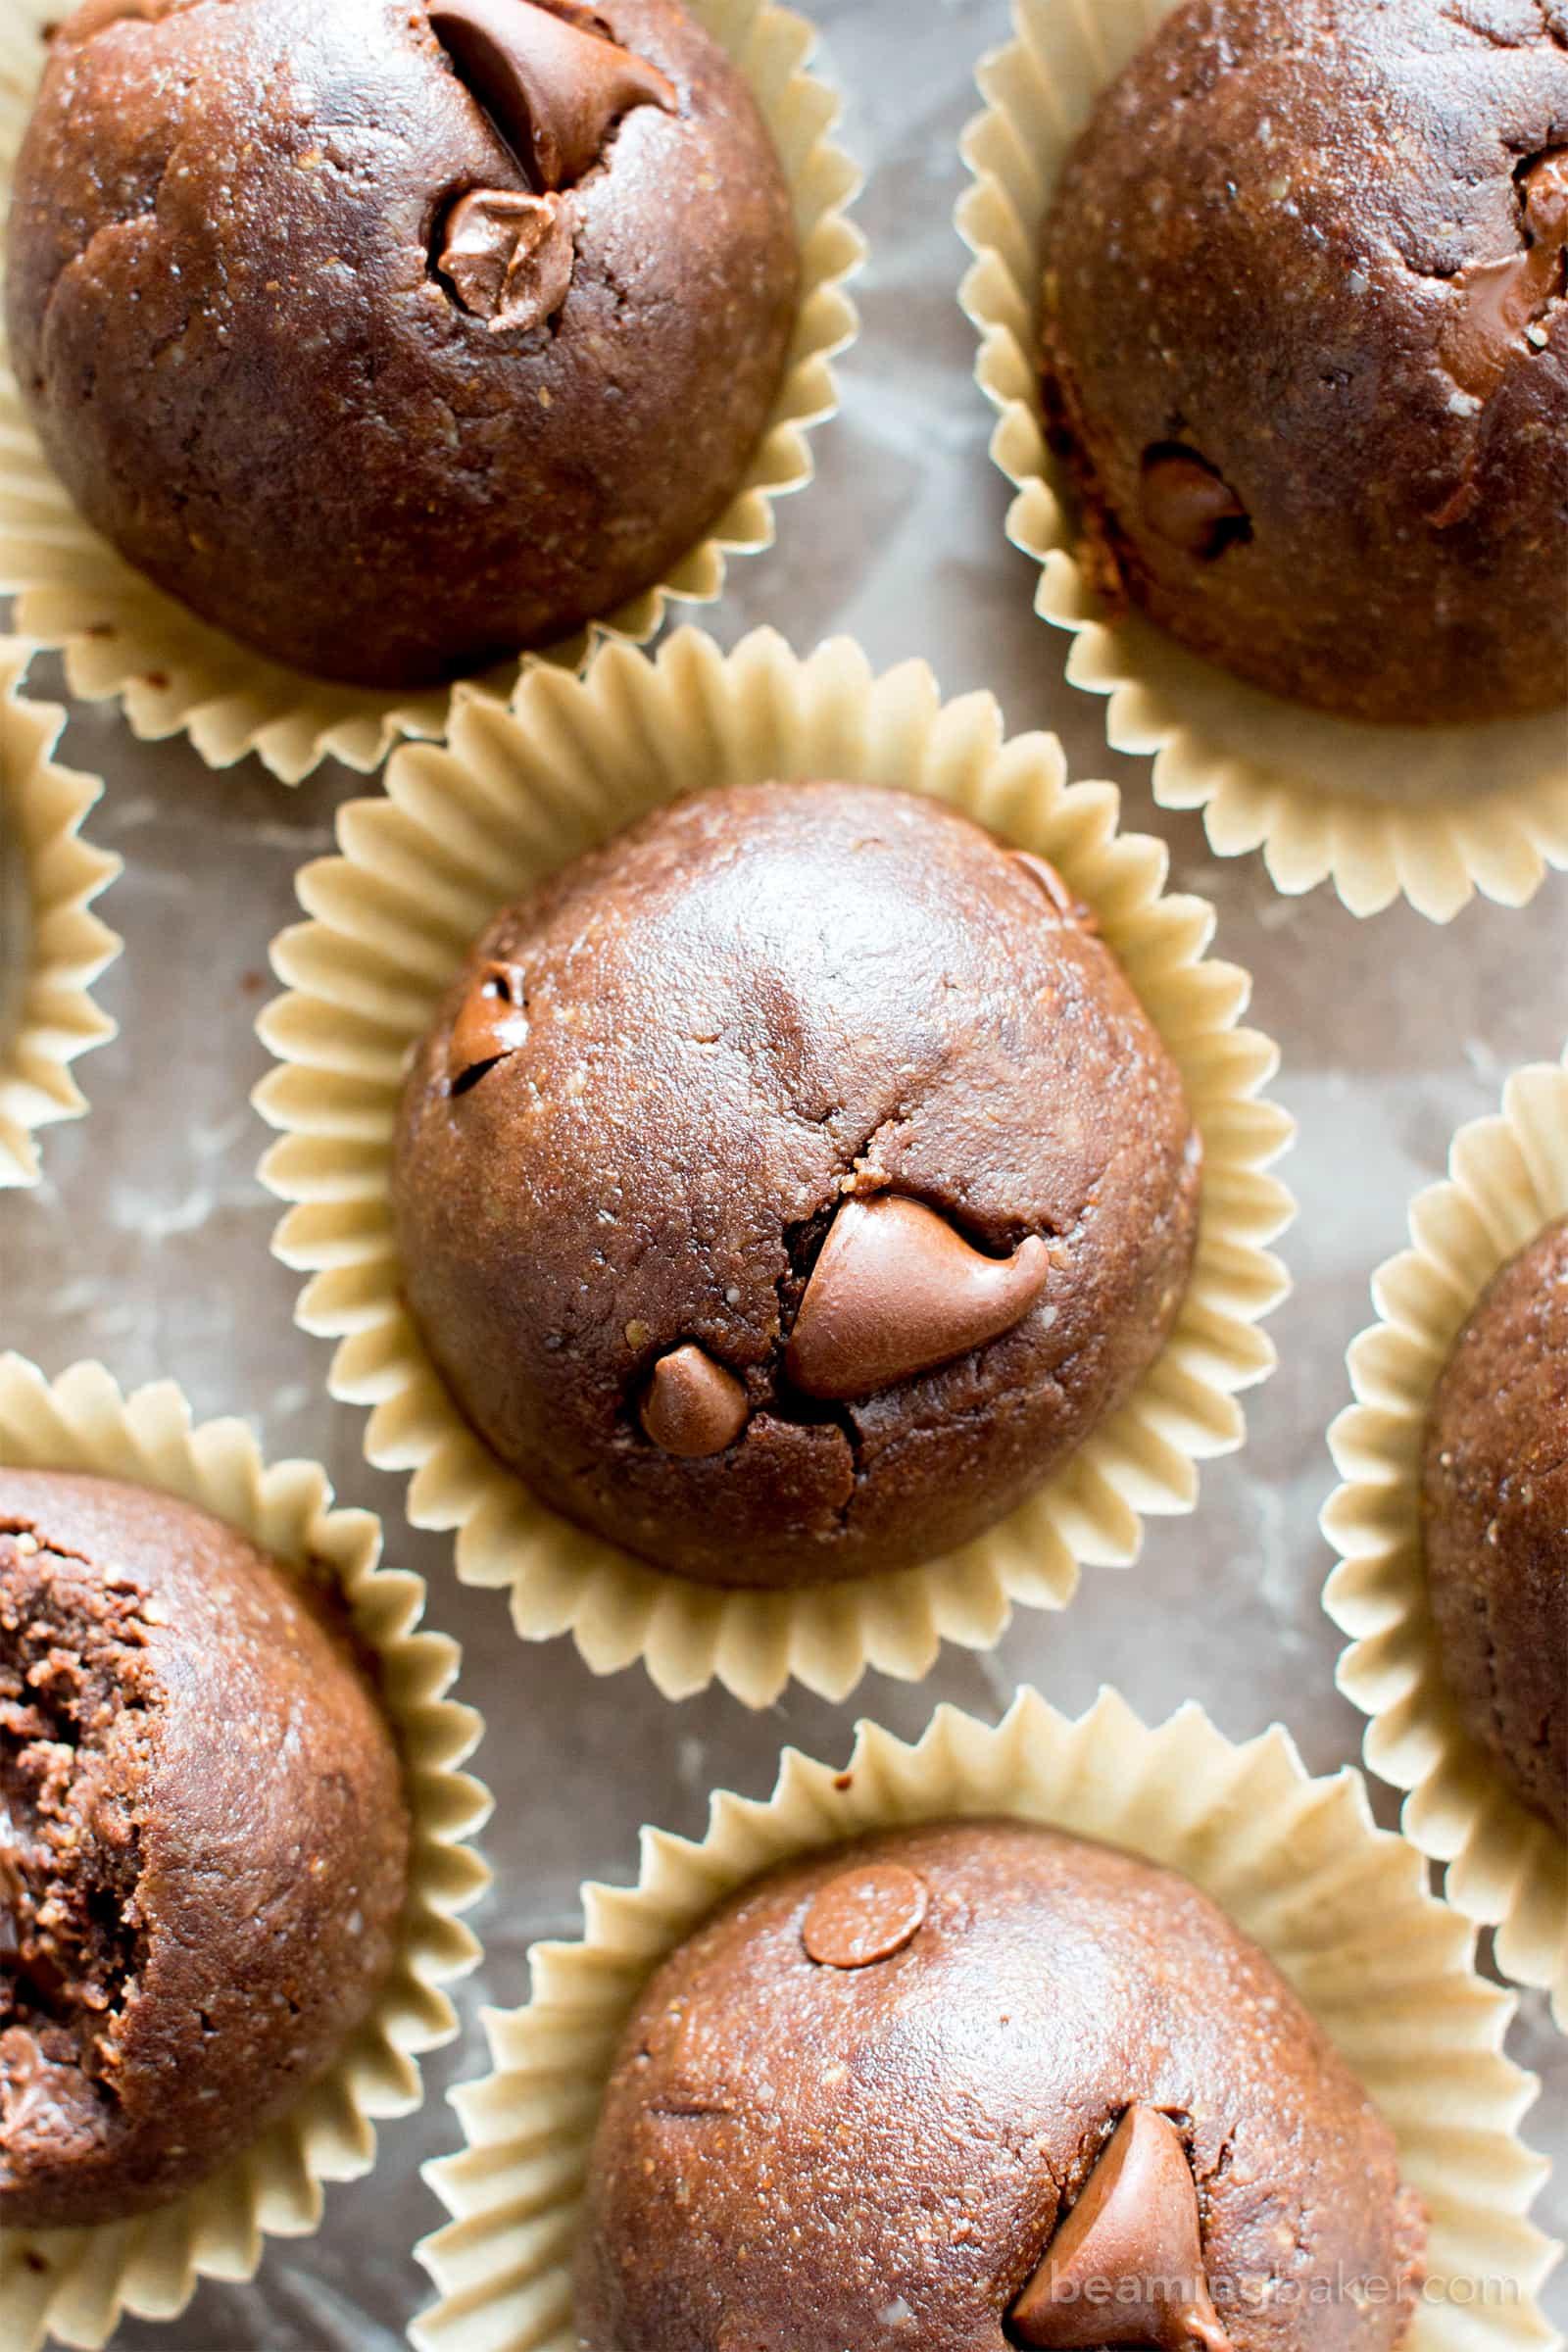 No Bake Almond Butter Paleo Brownie Bites (V, GF): Melt in your mouth fudgy paleo brownie bites that taste like a bite of pure chocolate. #Vegan #Paleo #DairyFree #GlutenFree #Chocolate   Recipe on BeamingBaker.com